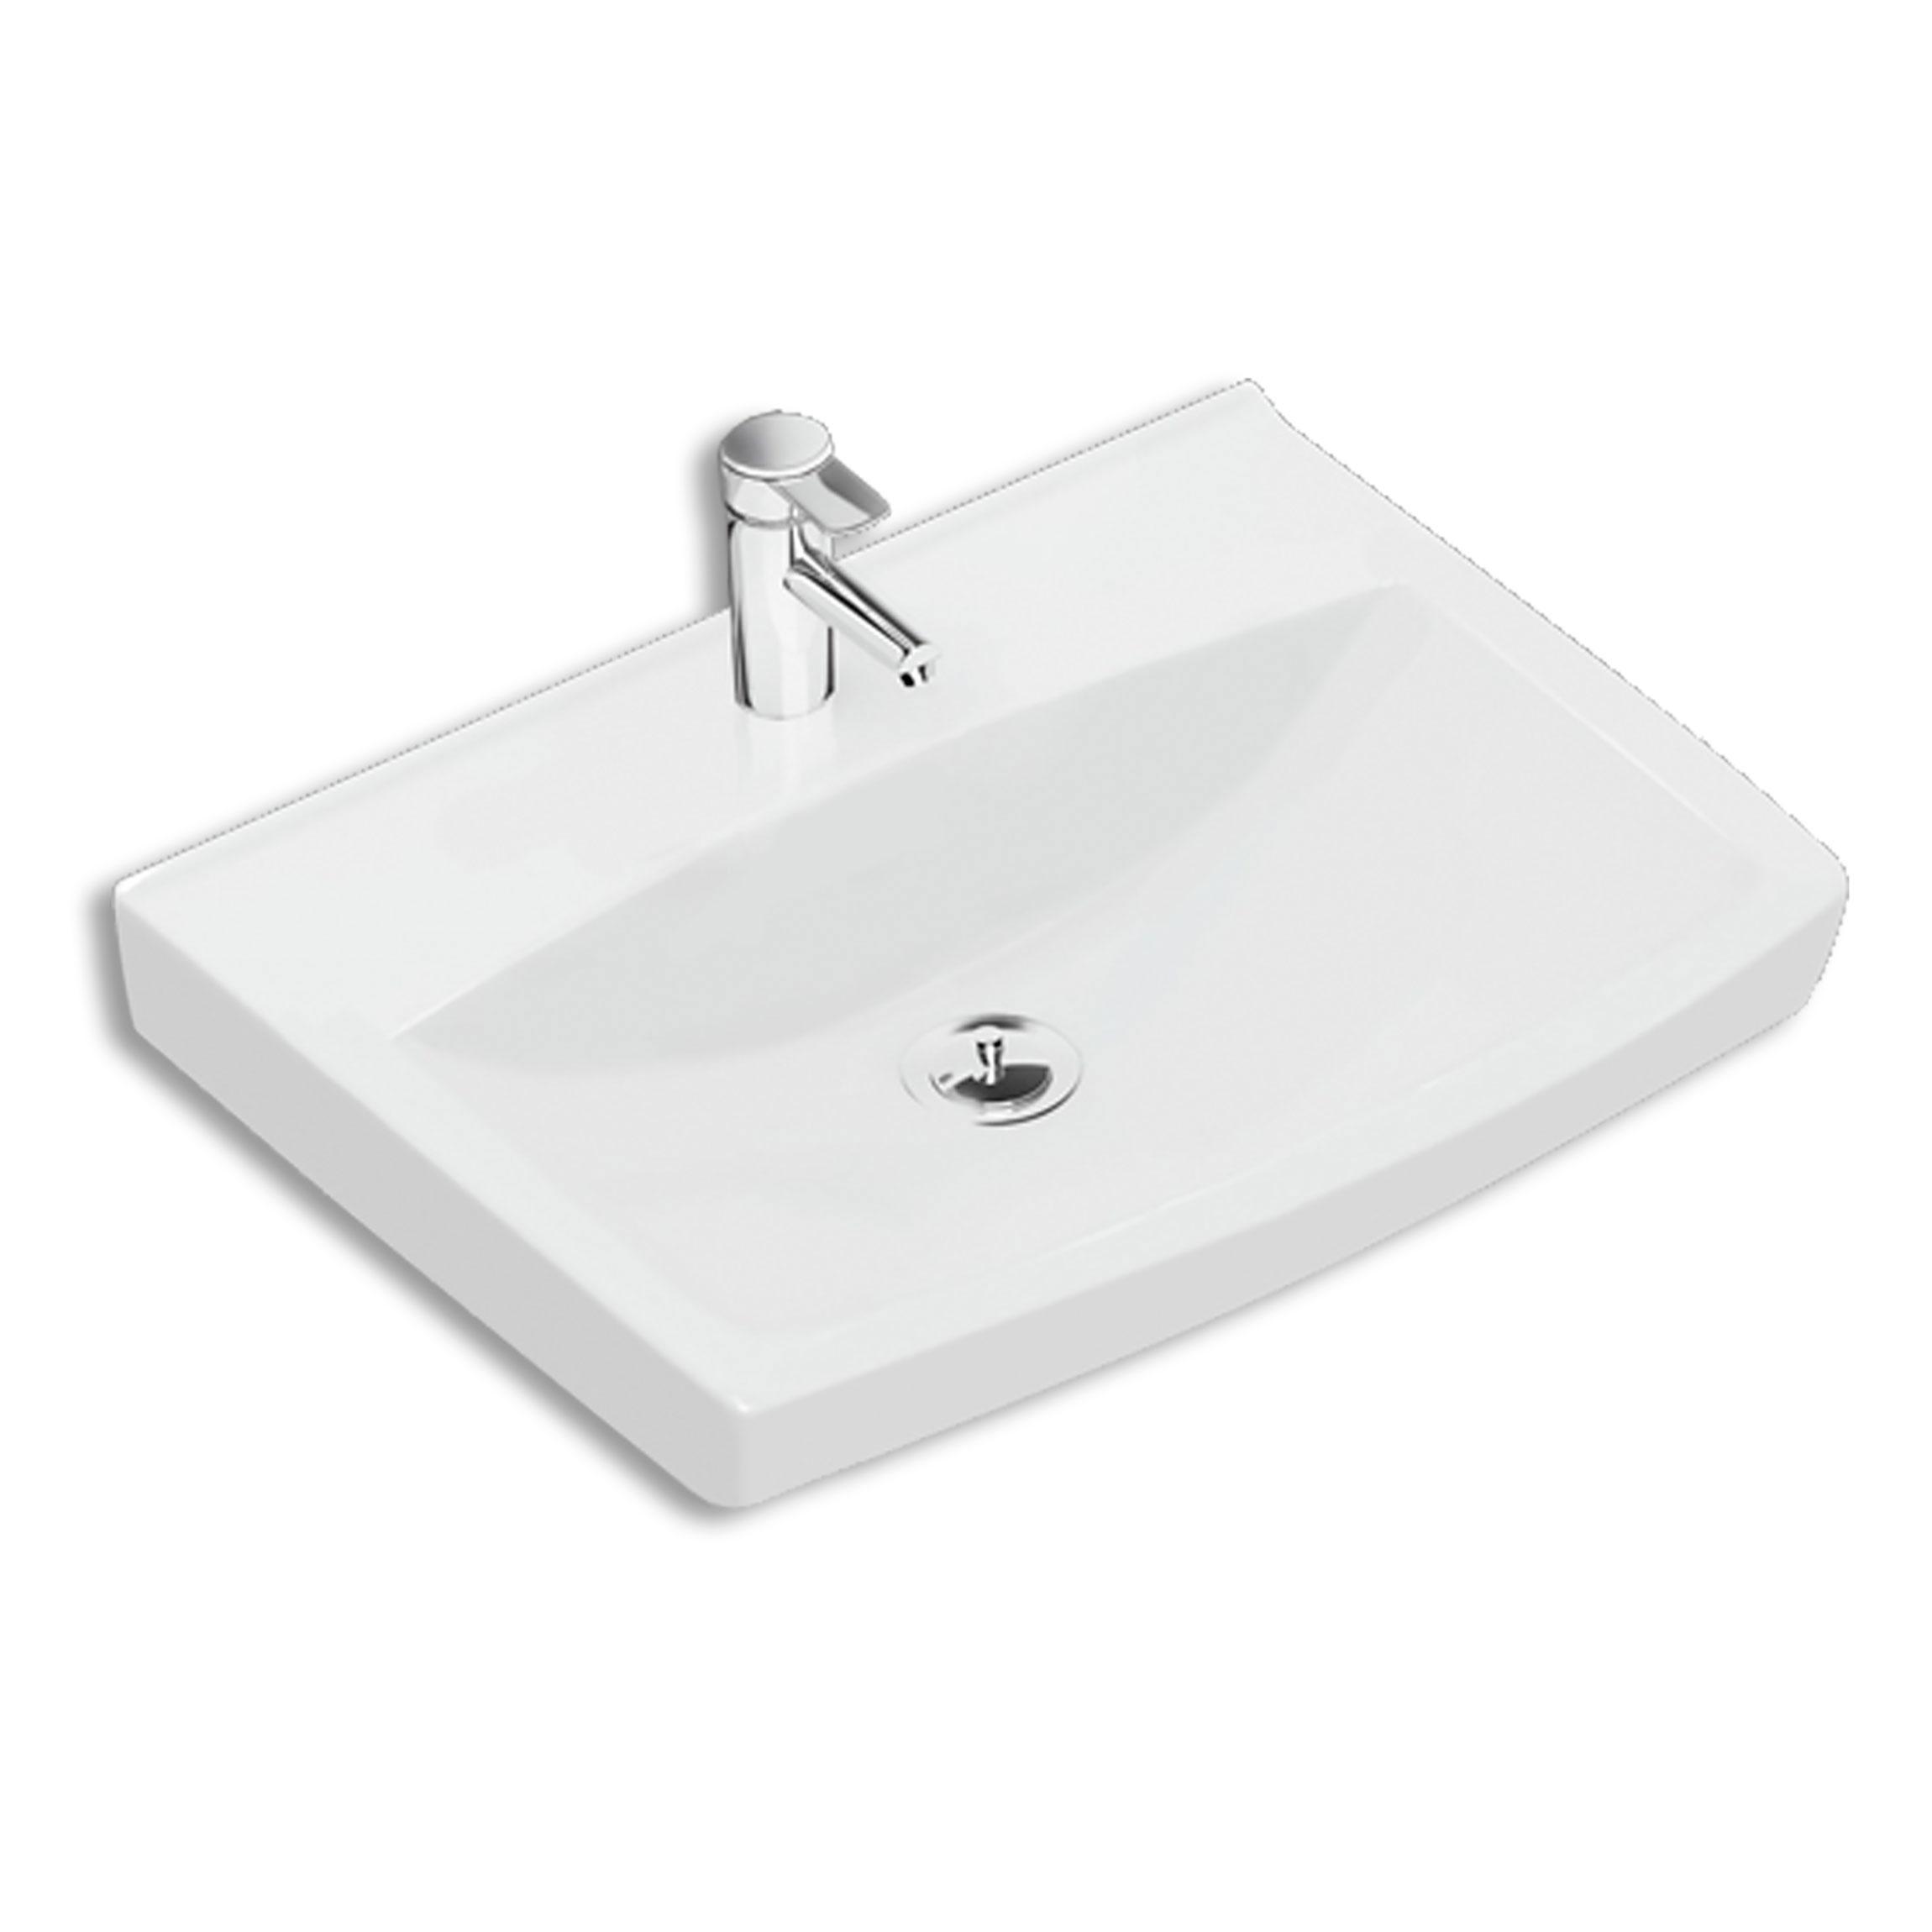 Tvättställ Ifö Spira 430 mm Infälld